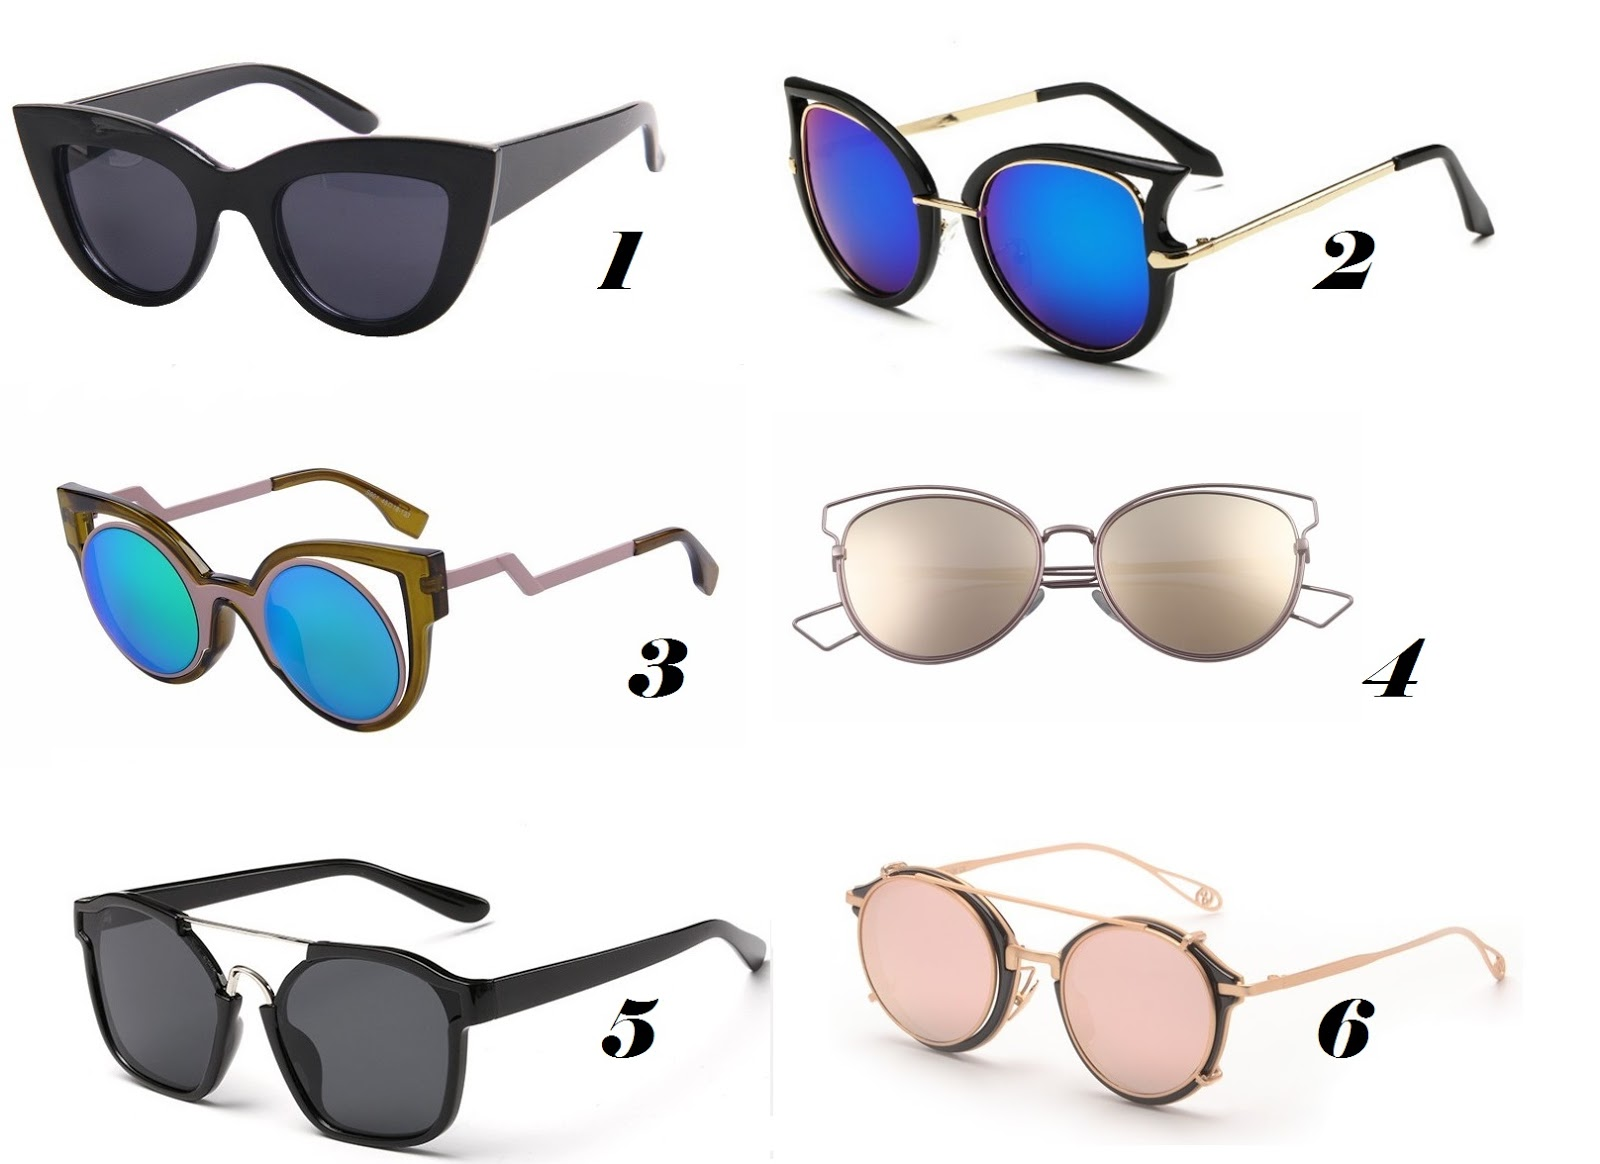 47693522835db It Guél  8 tendências de óculos de sol no AliExpress